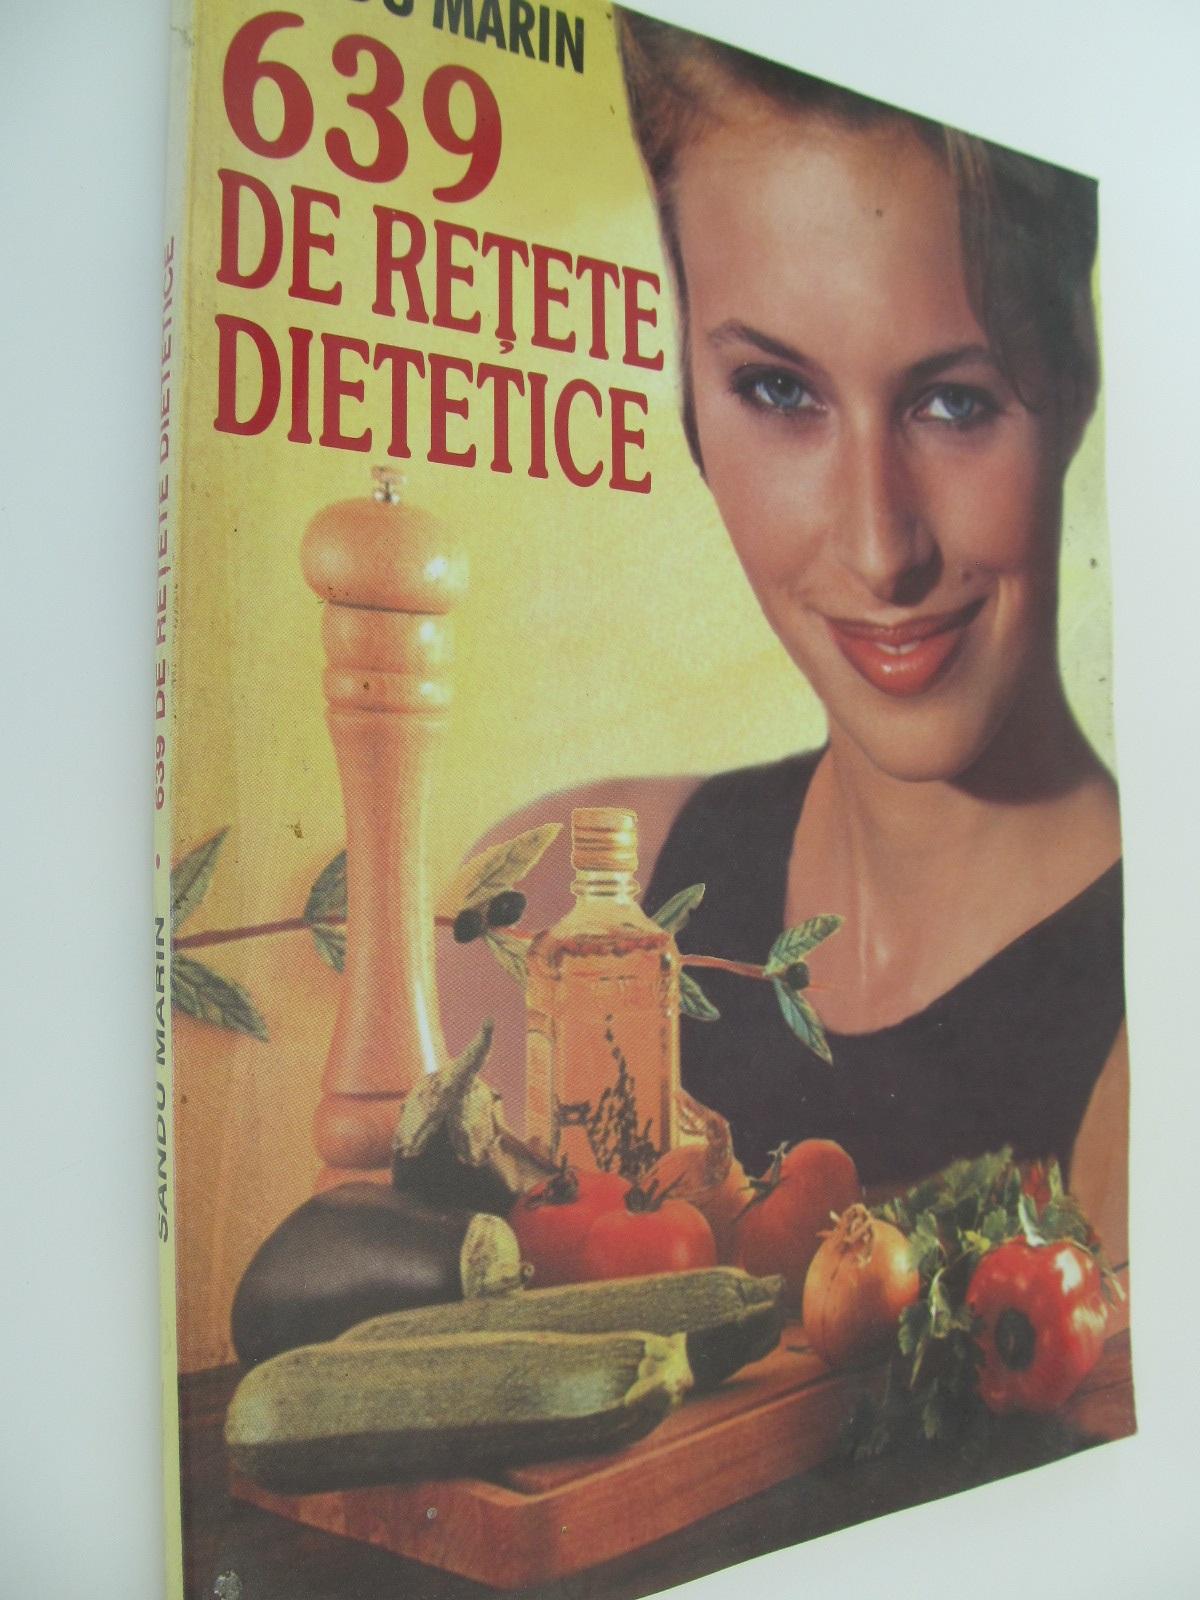 639 de retete dietetice - Sandu Marin | Detalii carte